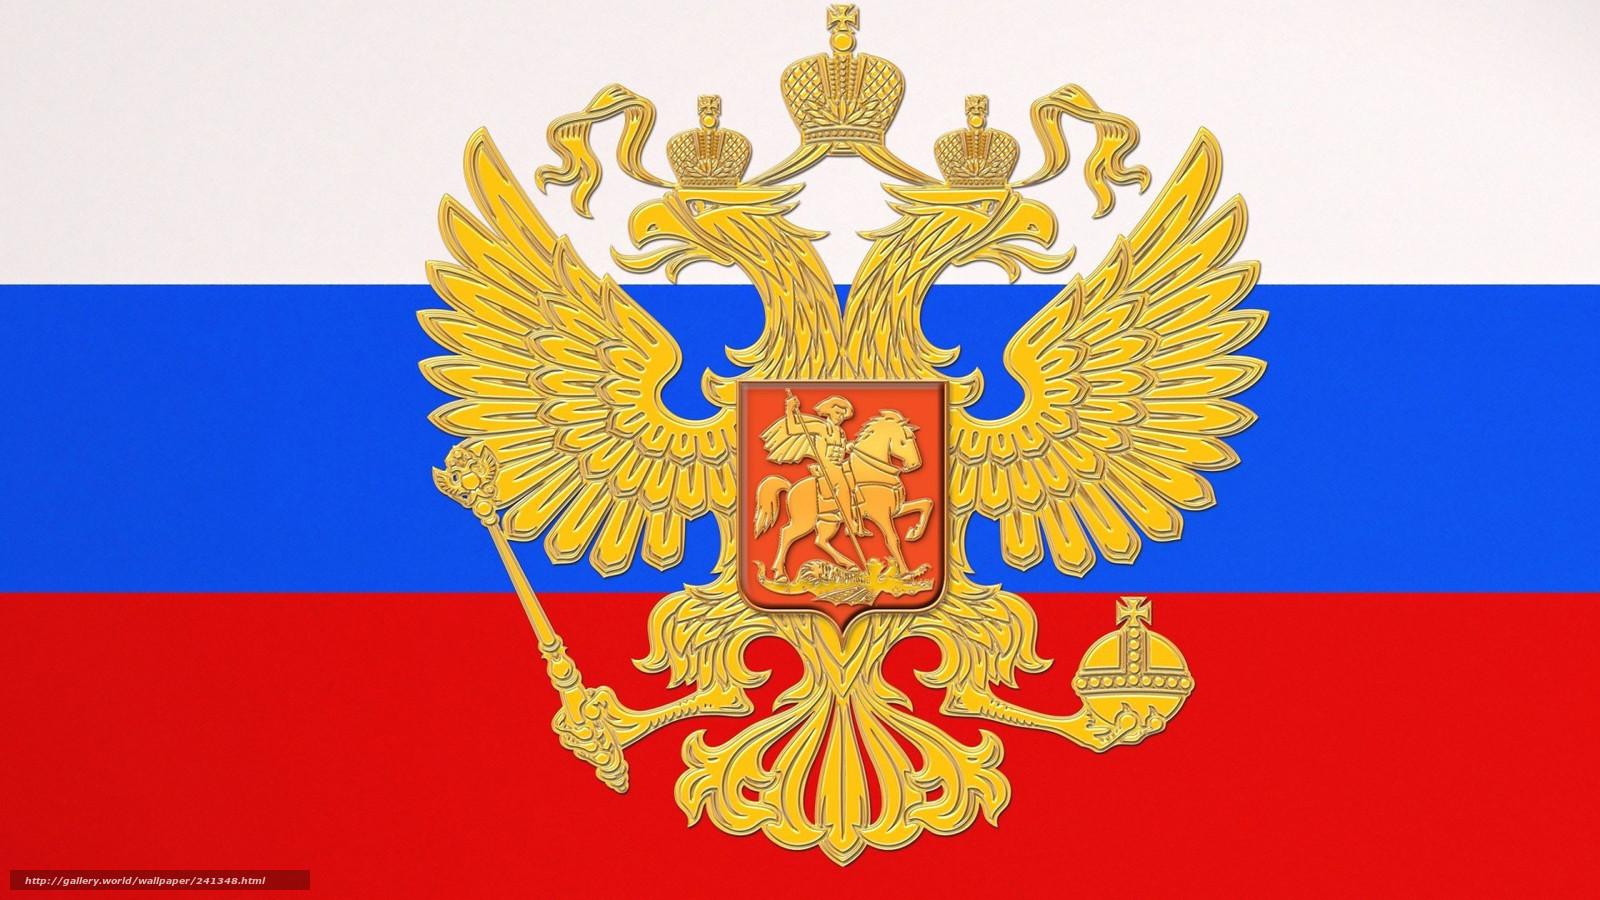 Герб россии флаг россия триколор